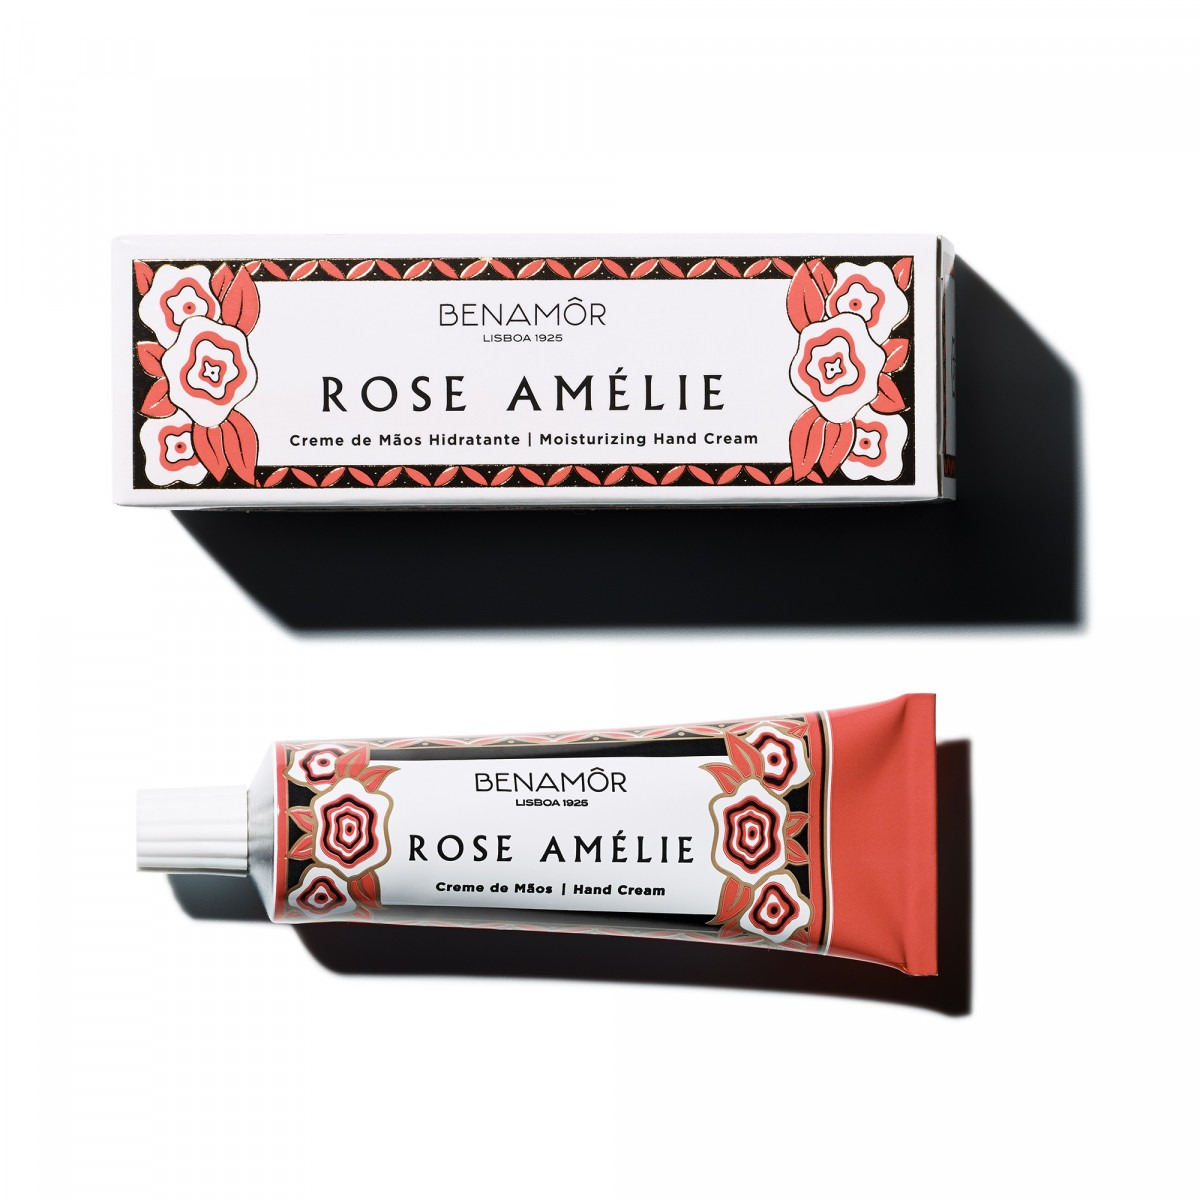 Benamor Rose Amelie Protective Hand Cream 30ml